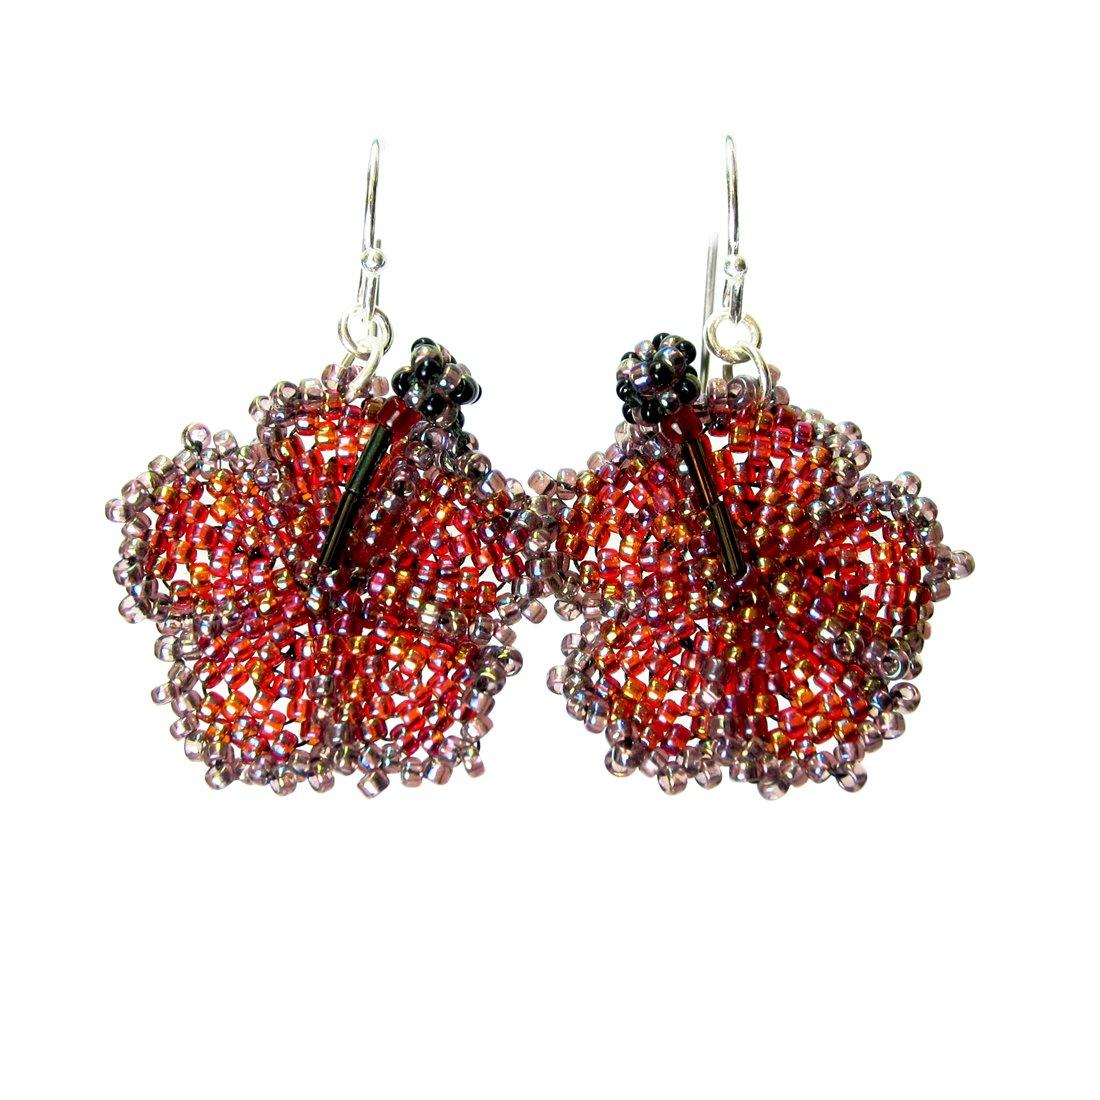 Canyon Sunset Heart in Hawaii Beaded Hibiscus Earrings